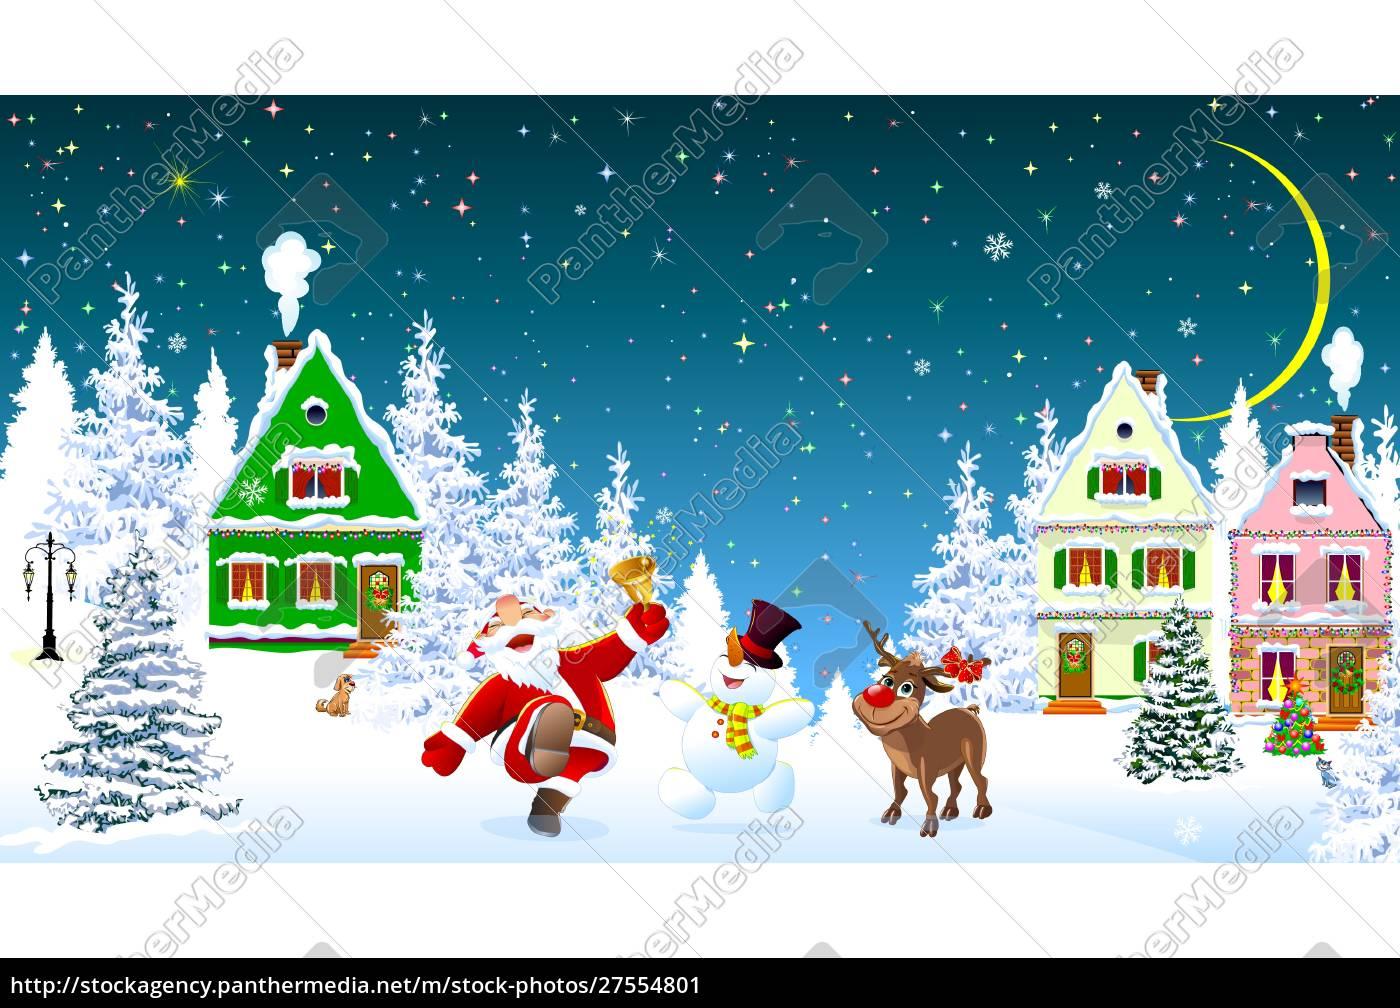 santa, claus, snowman, deer, celebrate, christmas - 27554801